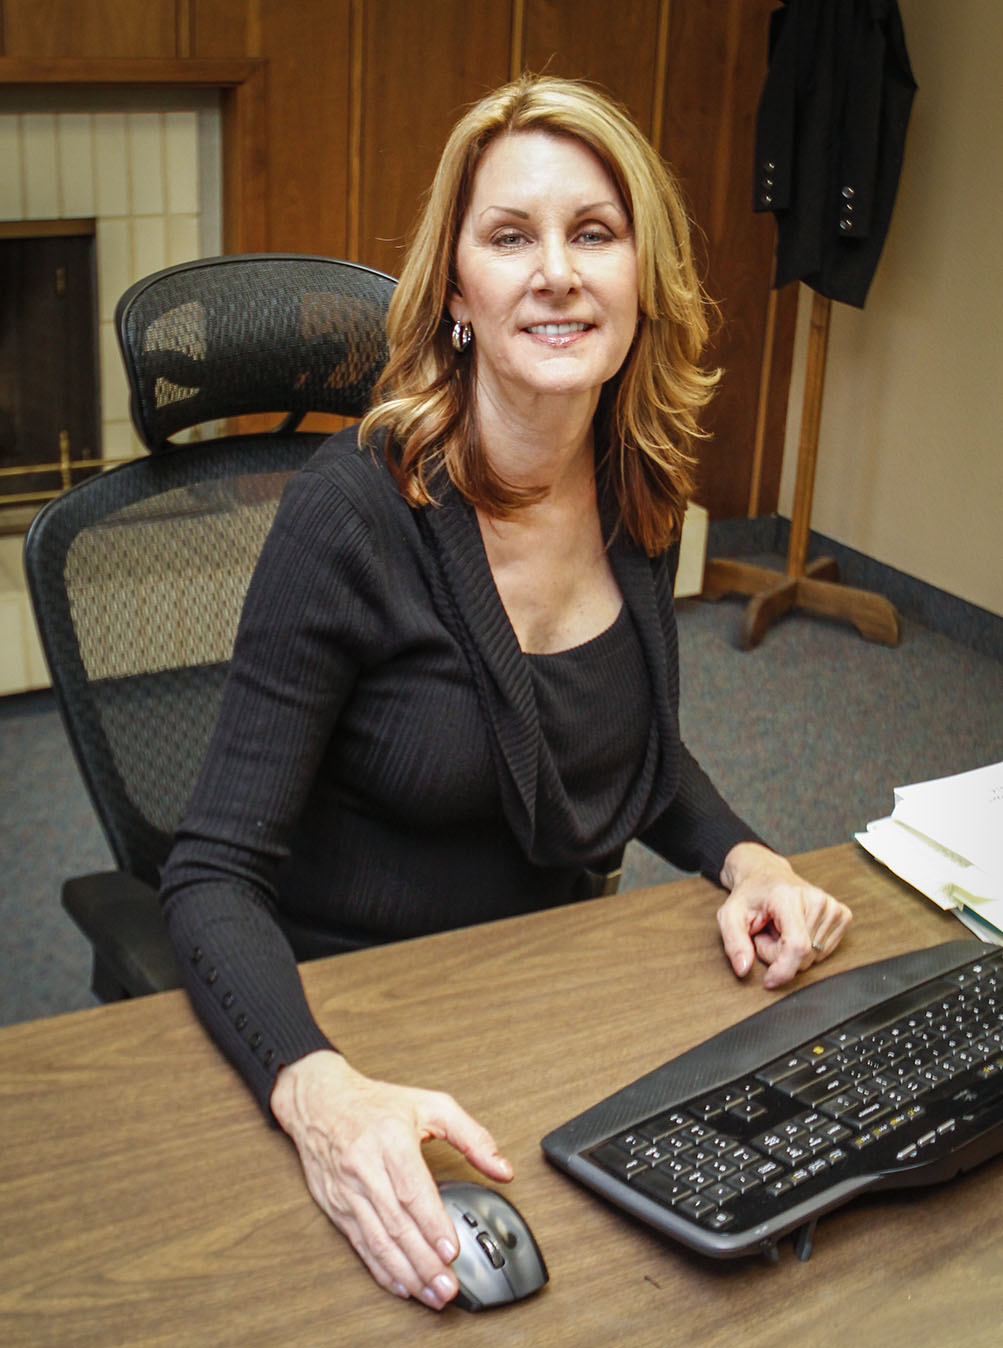 City Clerk Huntington Beach Candidates